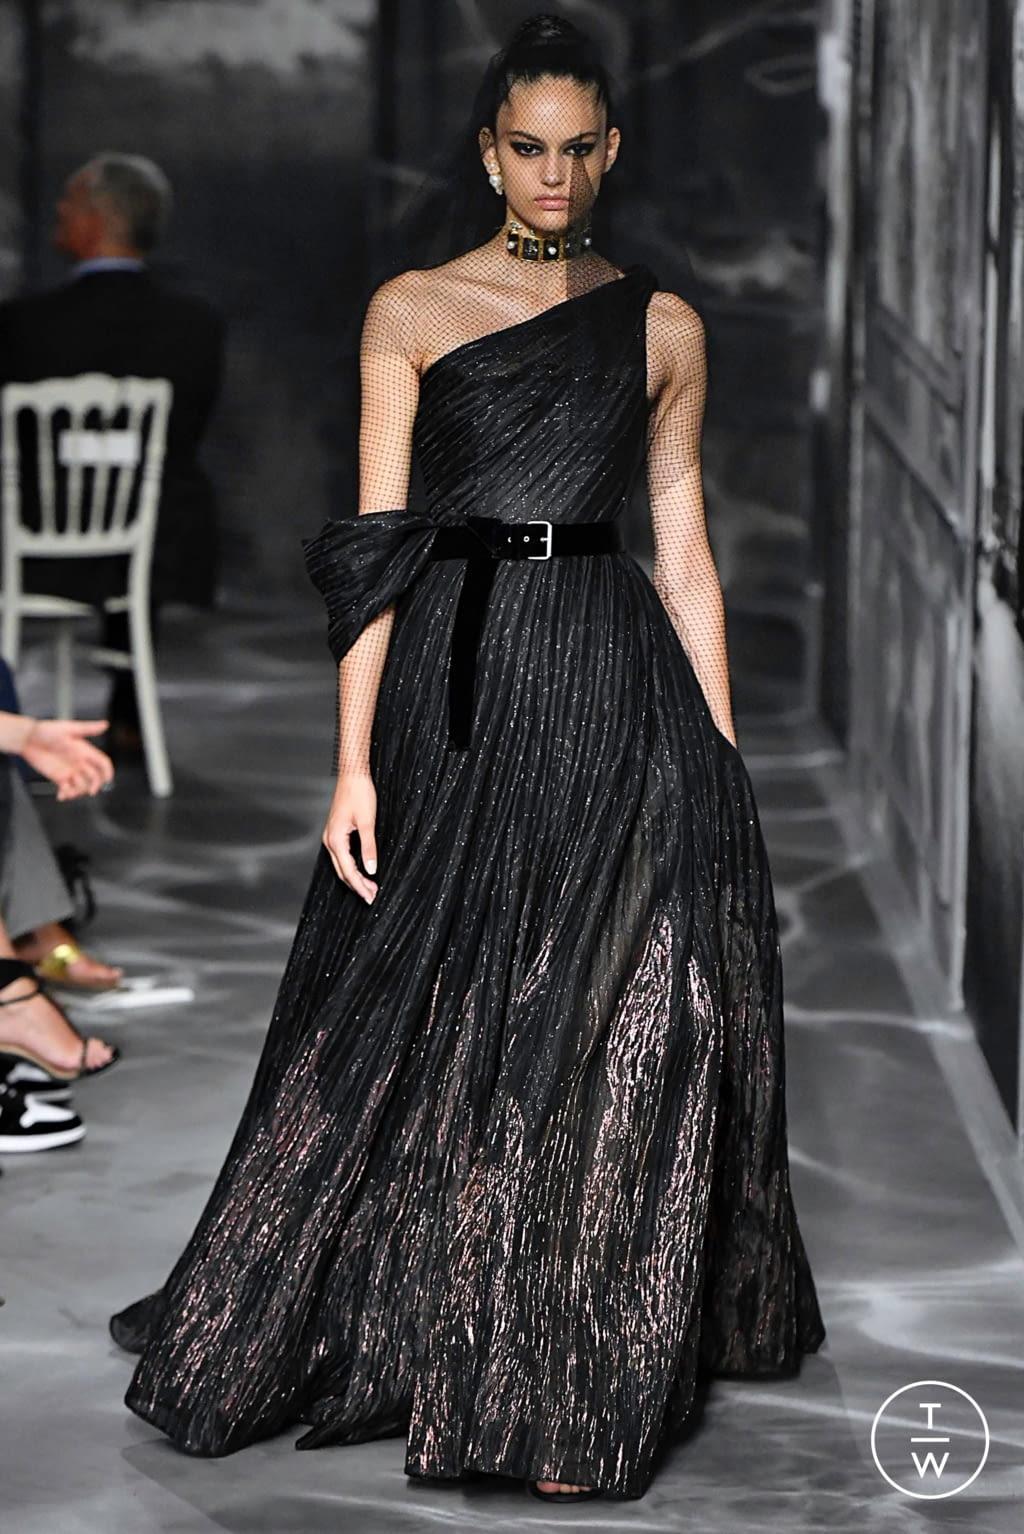 Fashion Week Paris Fall/Winter 2019 look 33 de la collection Christian Dior couture